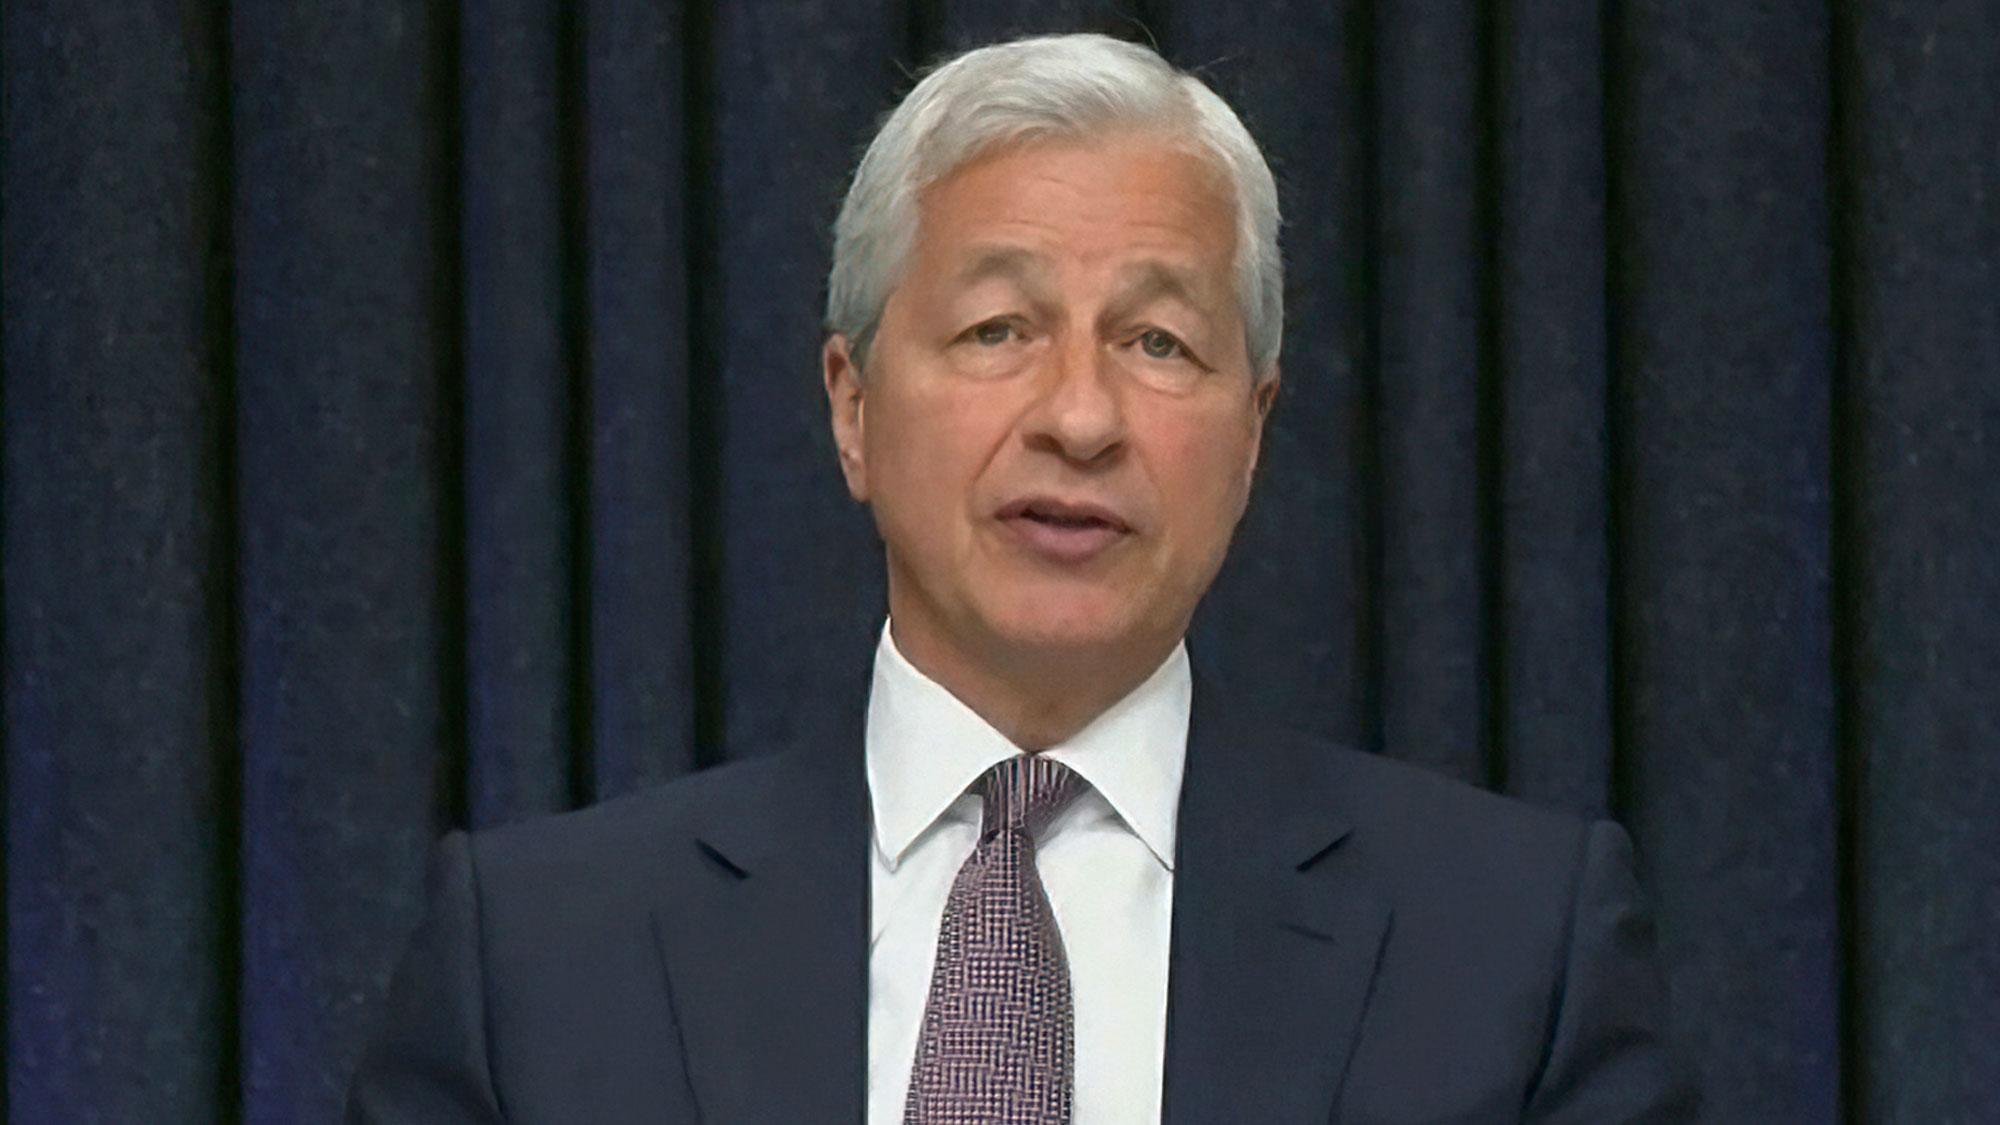 JPMorgan Chase CEO Jamie Dimon testifies to the Senate Banking Committee on Wednesday.